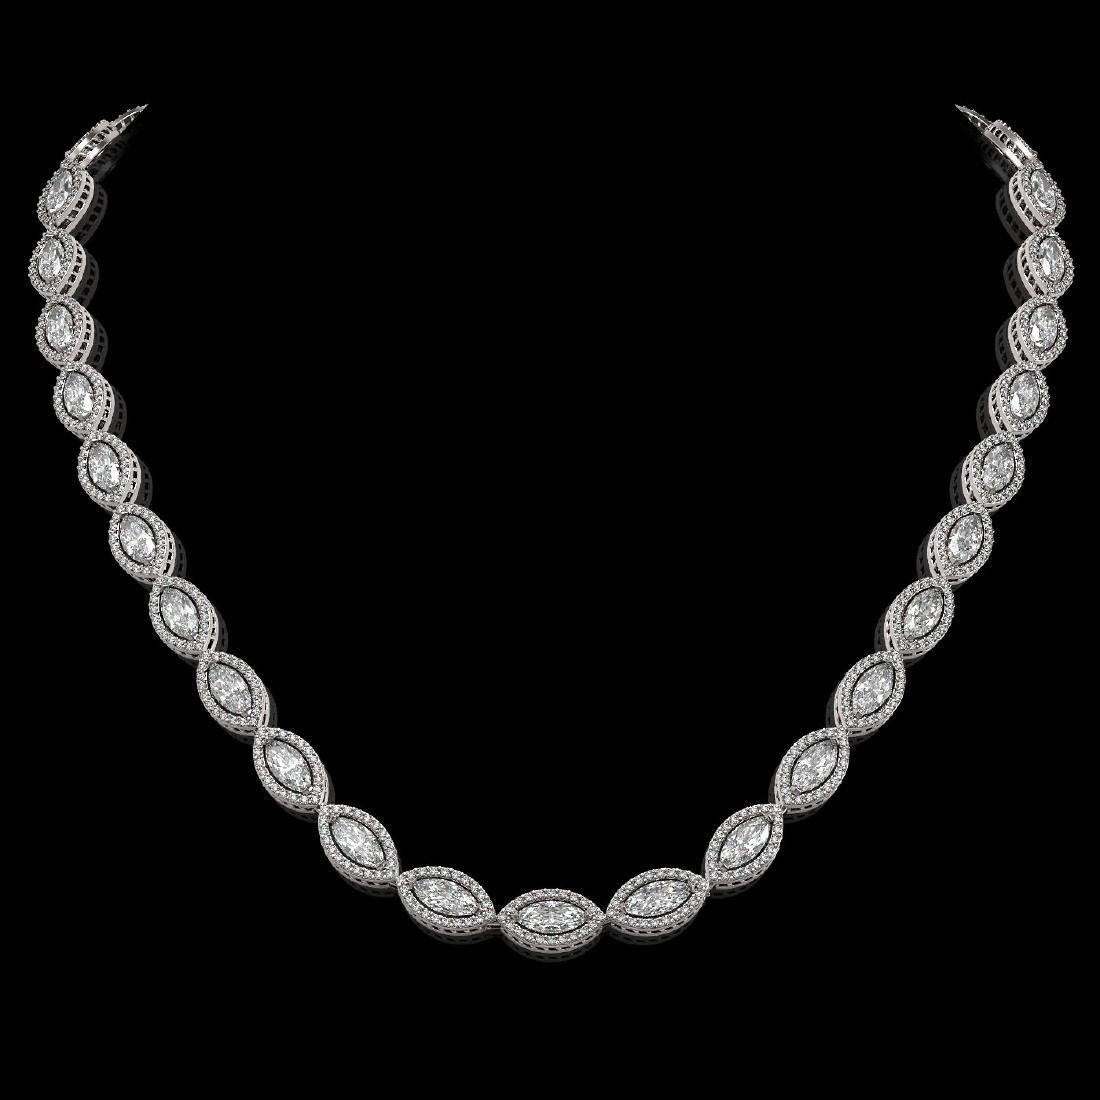 24.42 CTW Marquise Diamond Designer Necklace 18K White